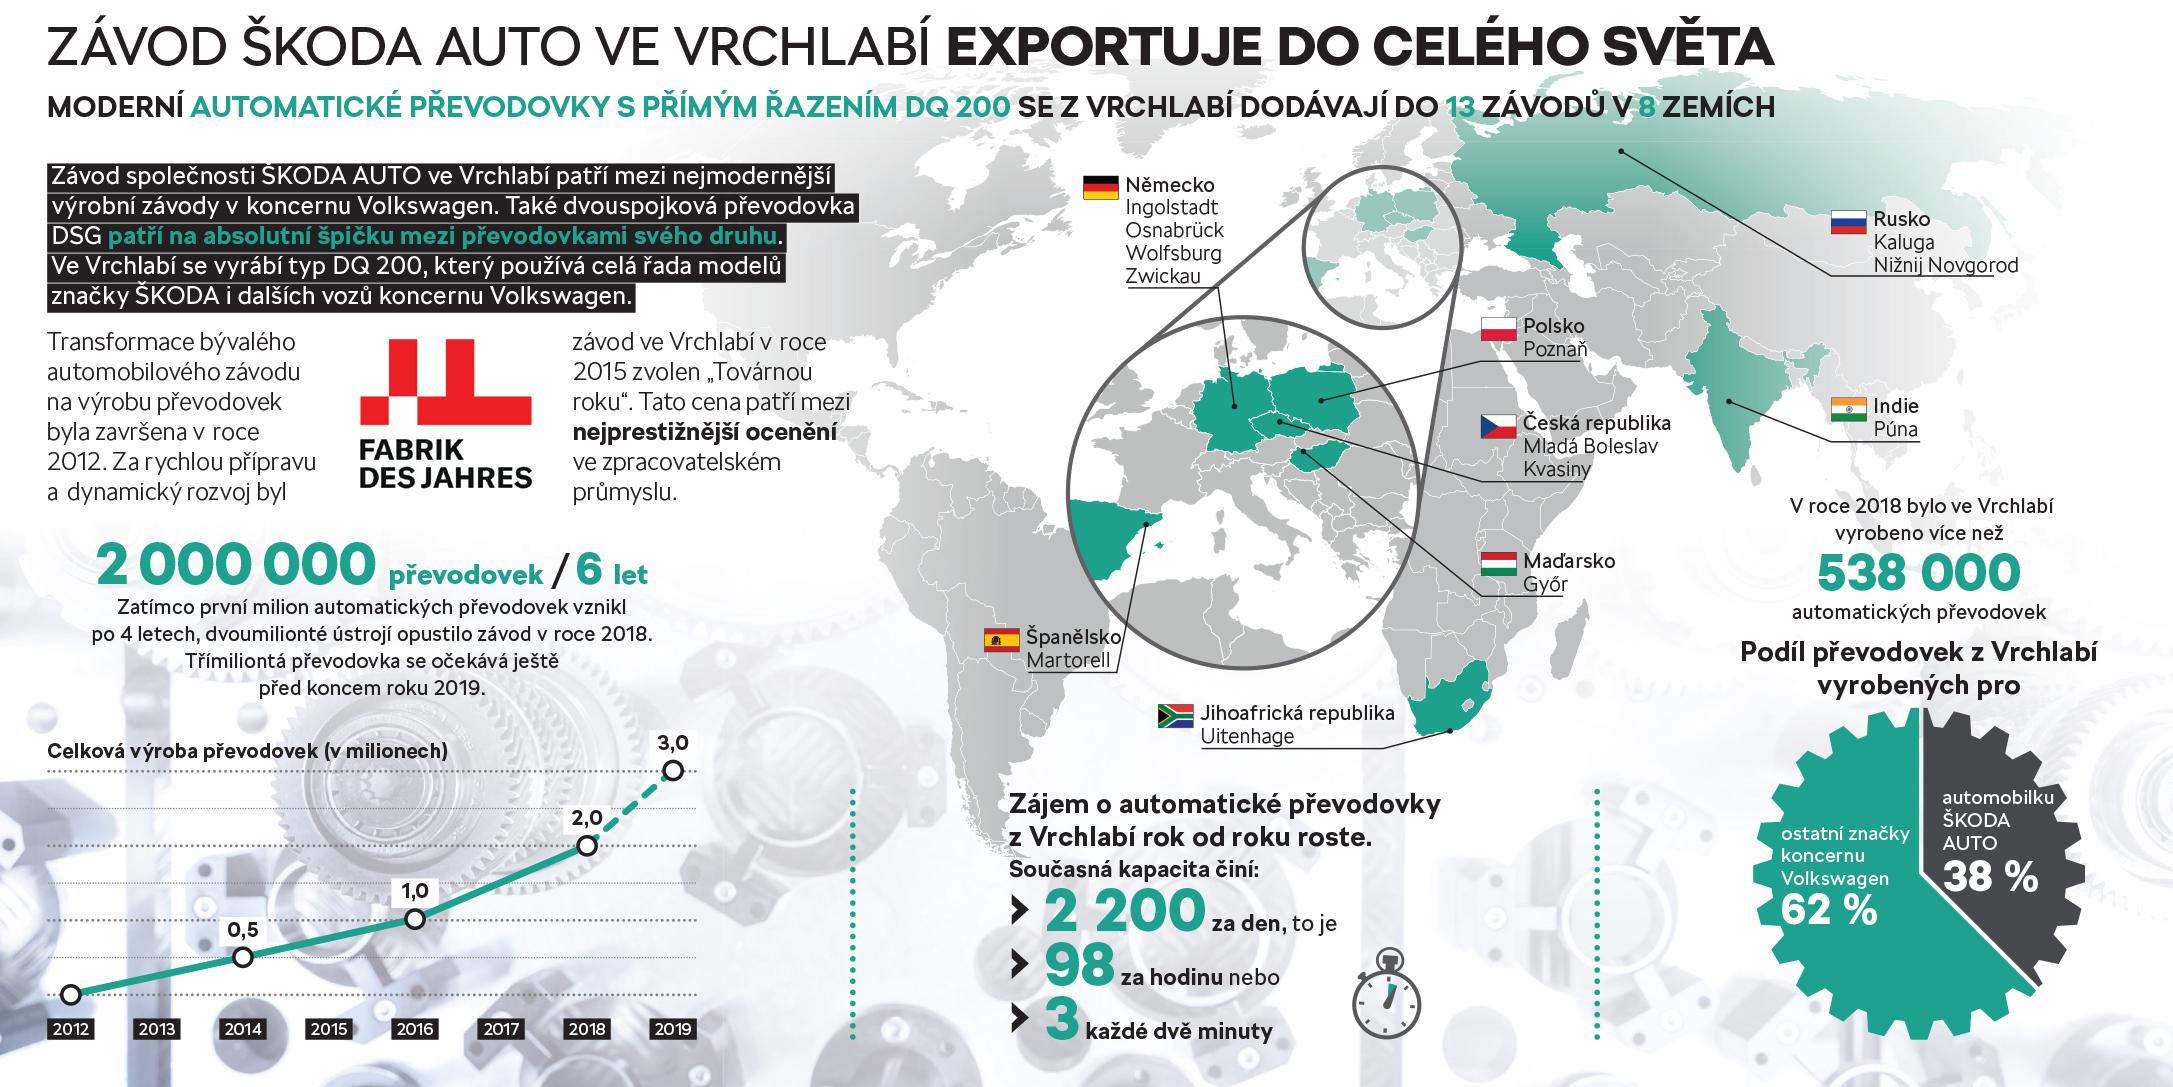 Vrchlabi-exportuje-do-celeho-sveta